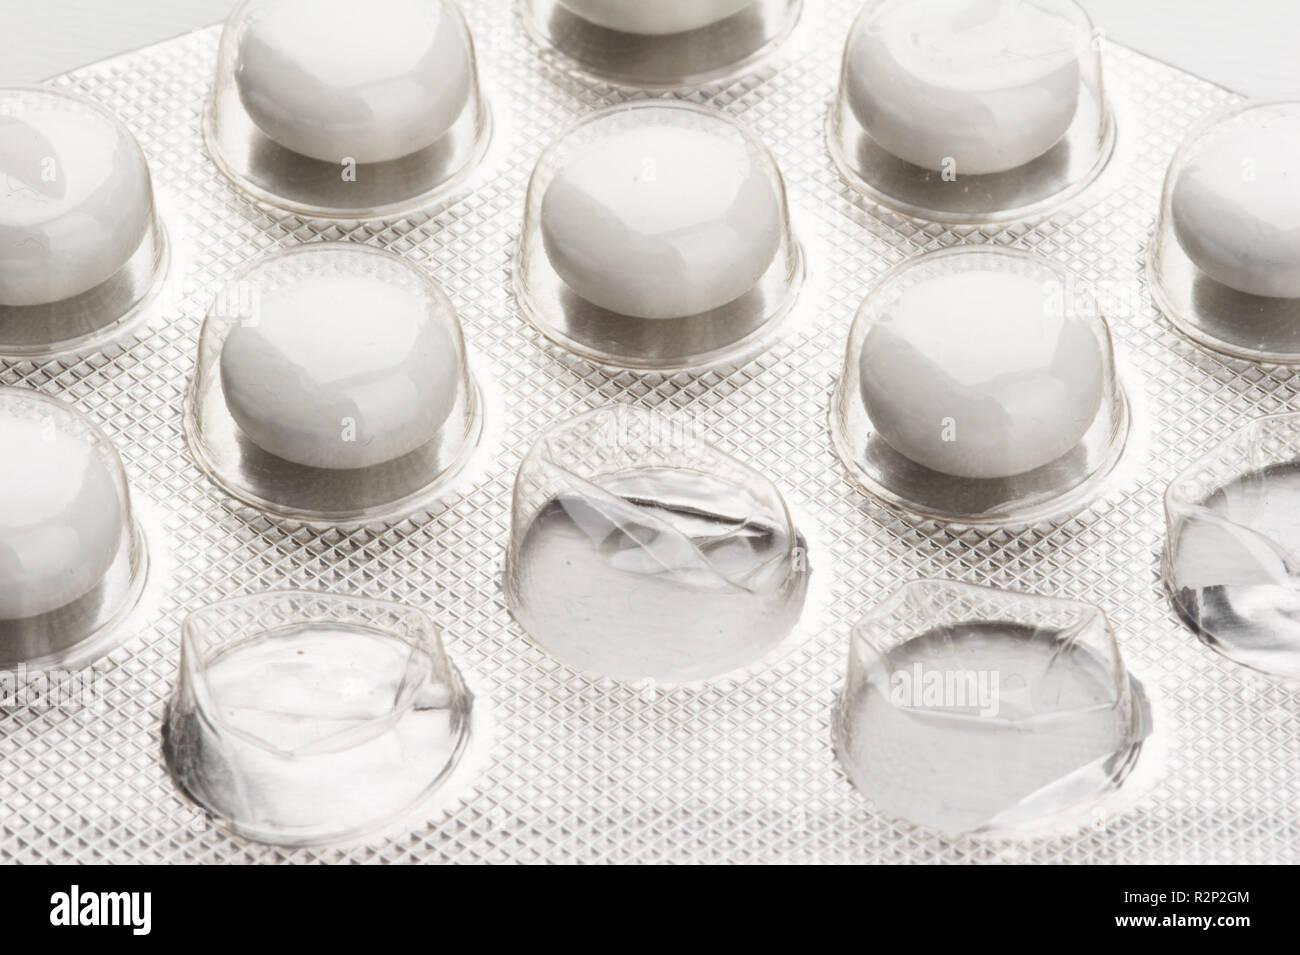 pills - medicine Stock Photo